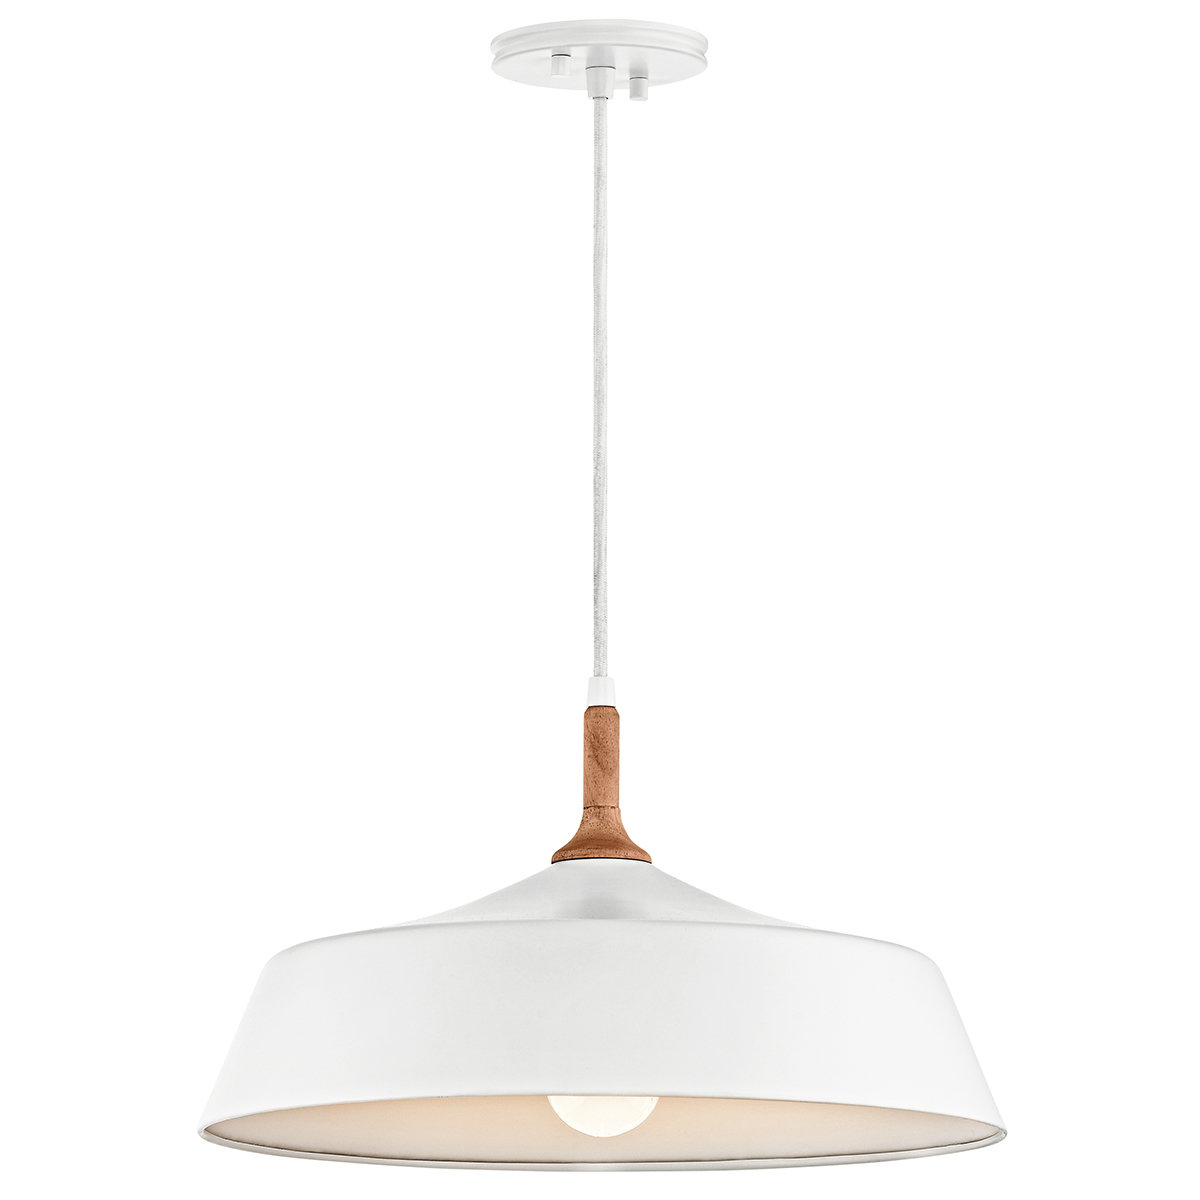 Evelyn 1-Light Single Dome Pendant for Popular 1-Light Single Dome Pendants